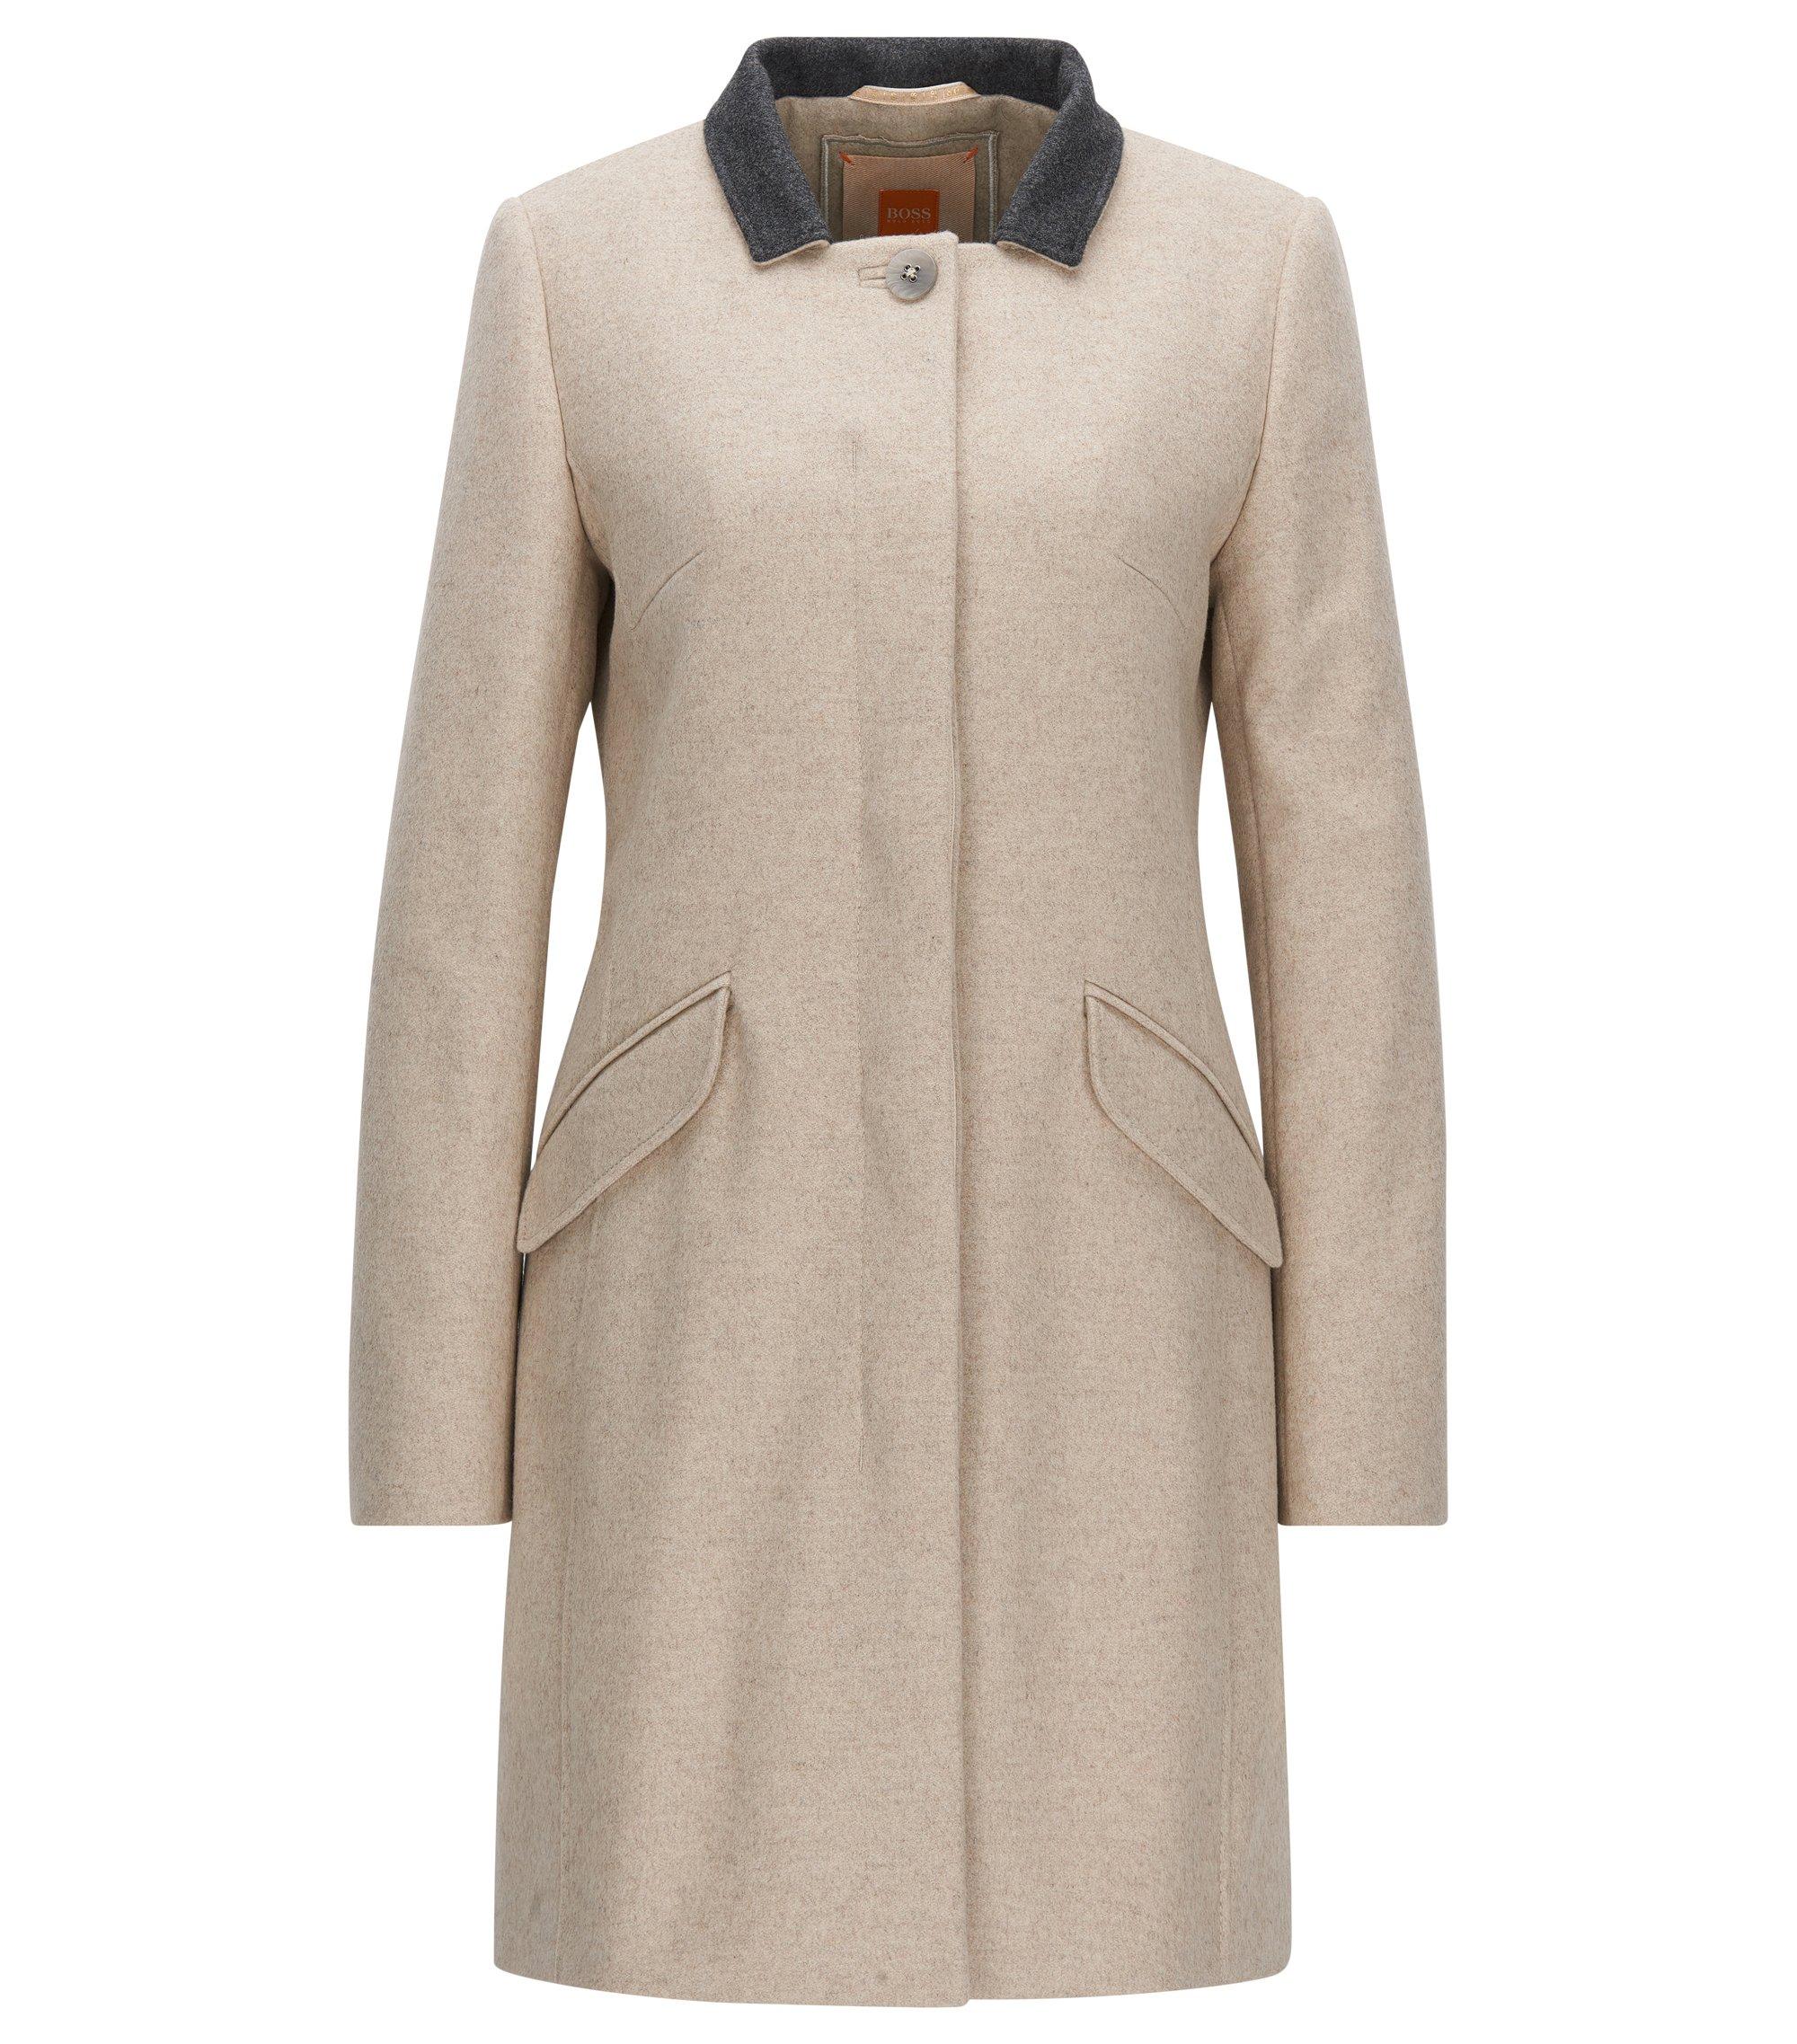 Abrigo regular fit en mezcla de lana con cierre de botones oculto, Natural